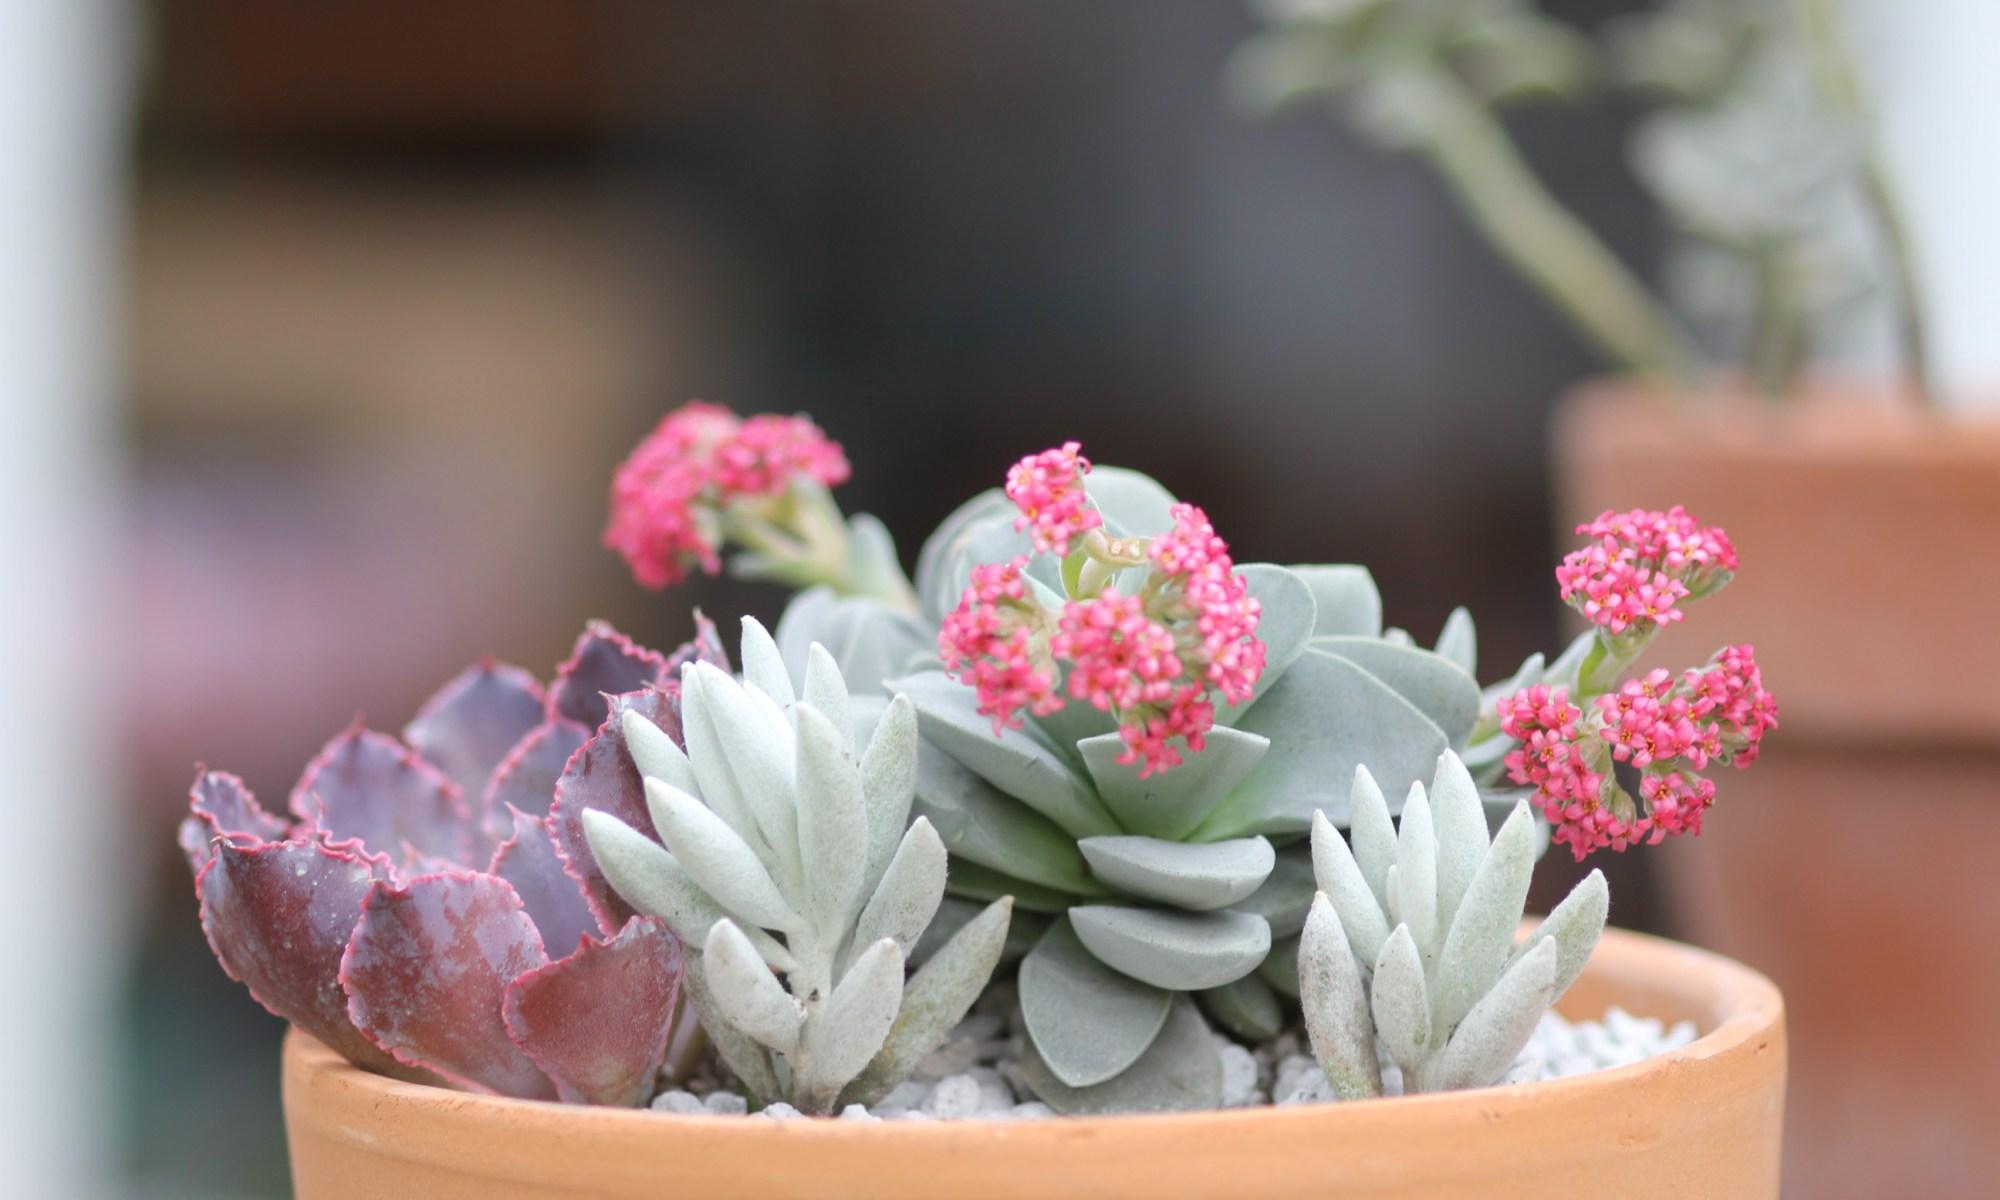 'Crassula Morgan's Pink' C. falcata x C. mesembryanthemopsis